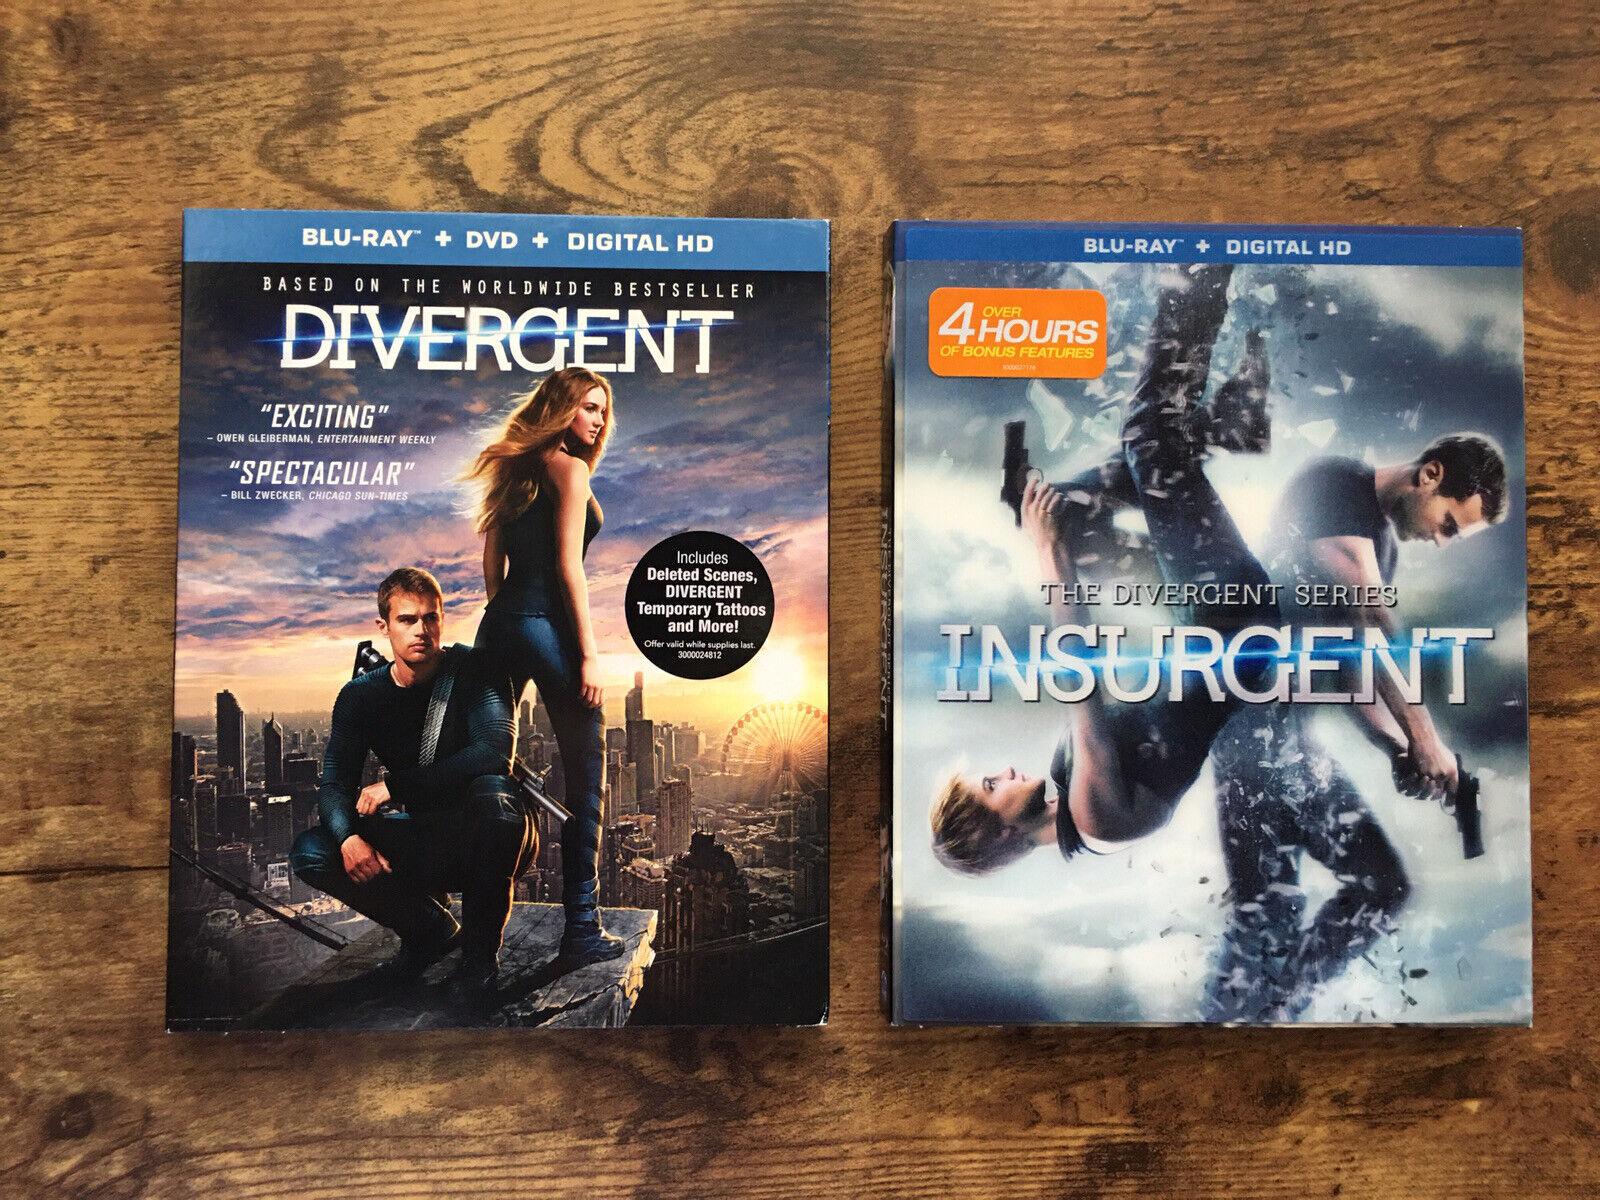 The Divergent Series Insurgent 2015 Insurgent 2014 Blu Rays Lot Of 2 Ebay